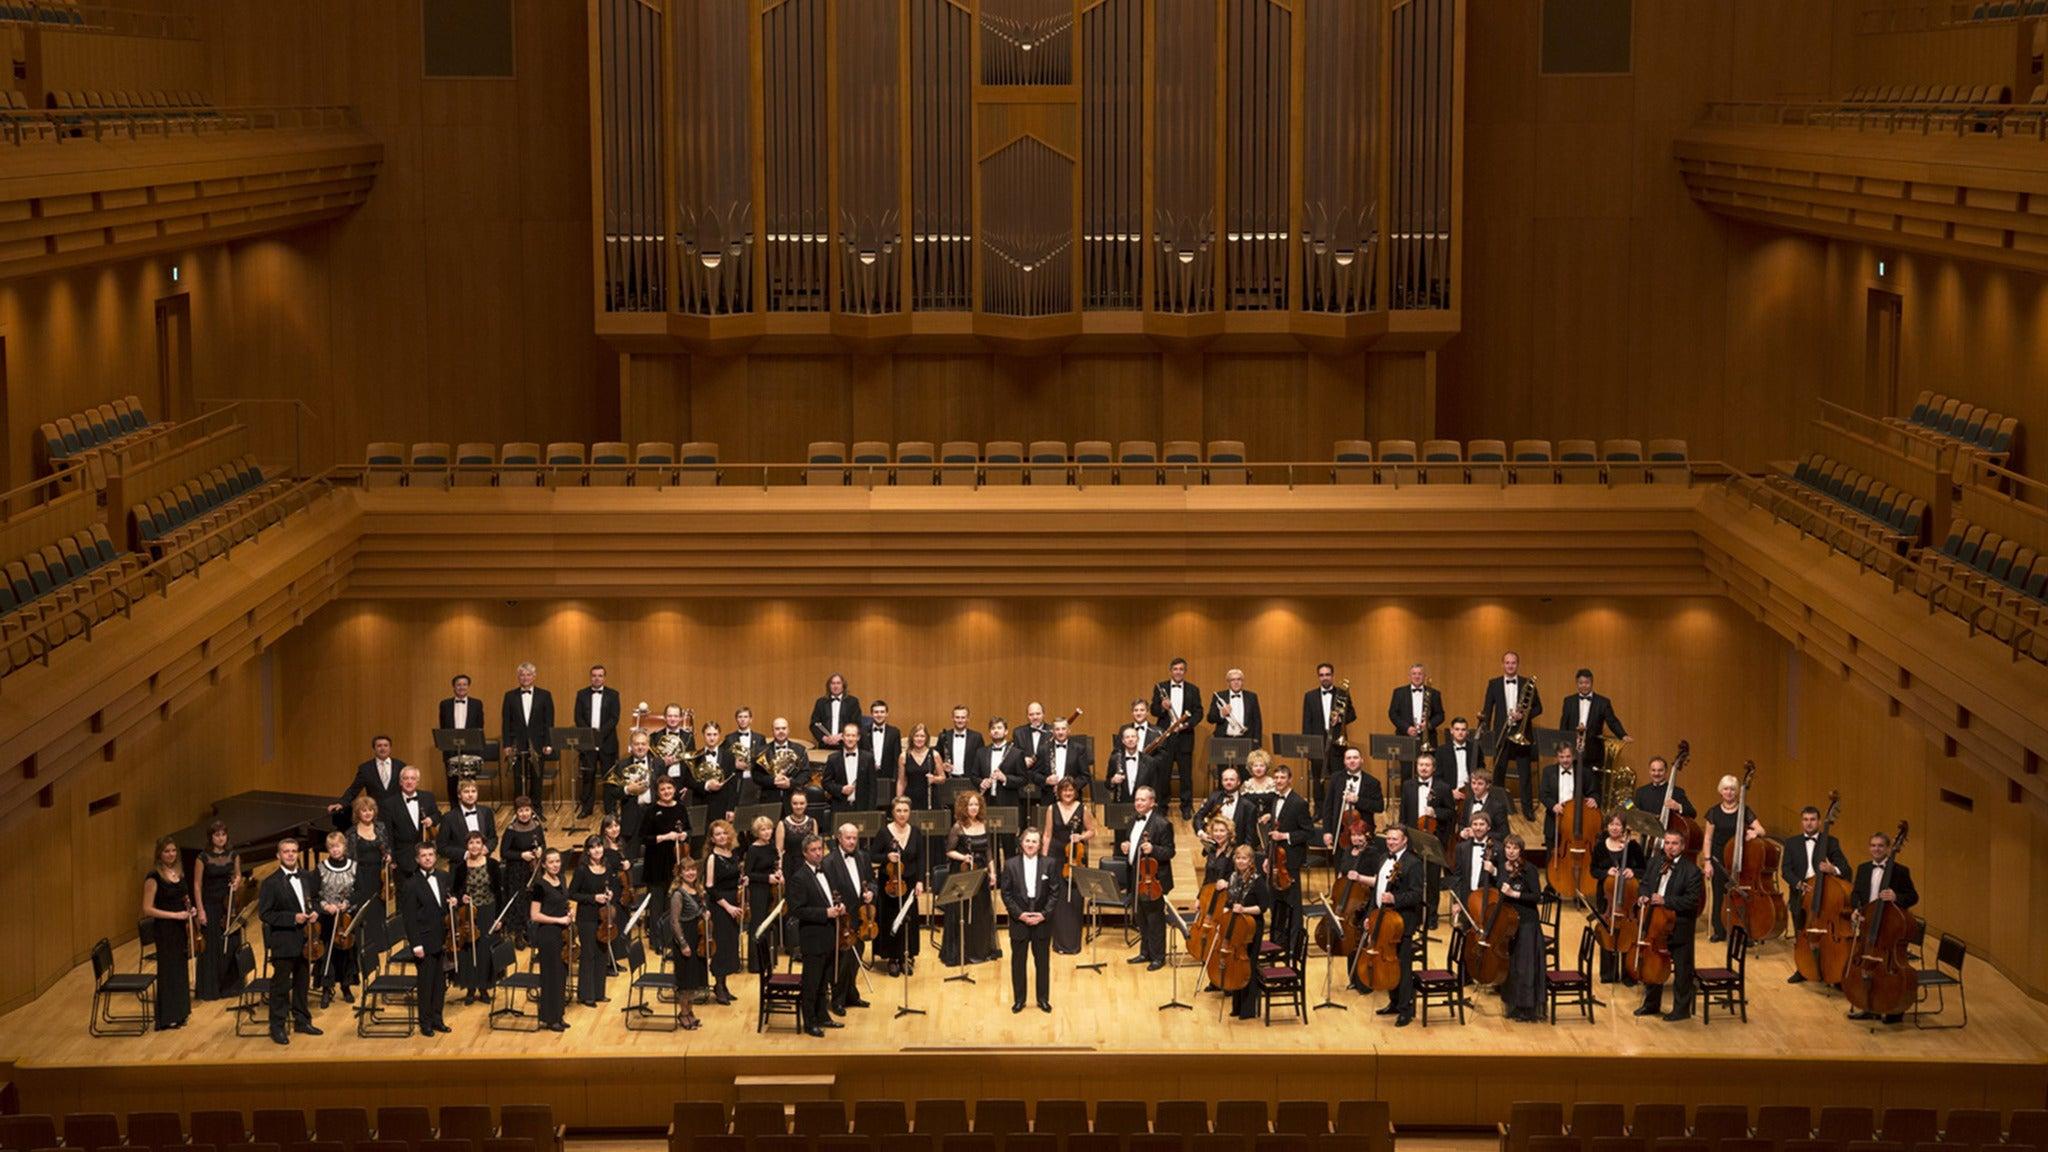 National Symphony Orchestra of Ukraine - Morristown, NJ 07960